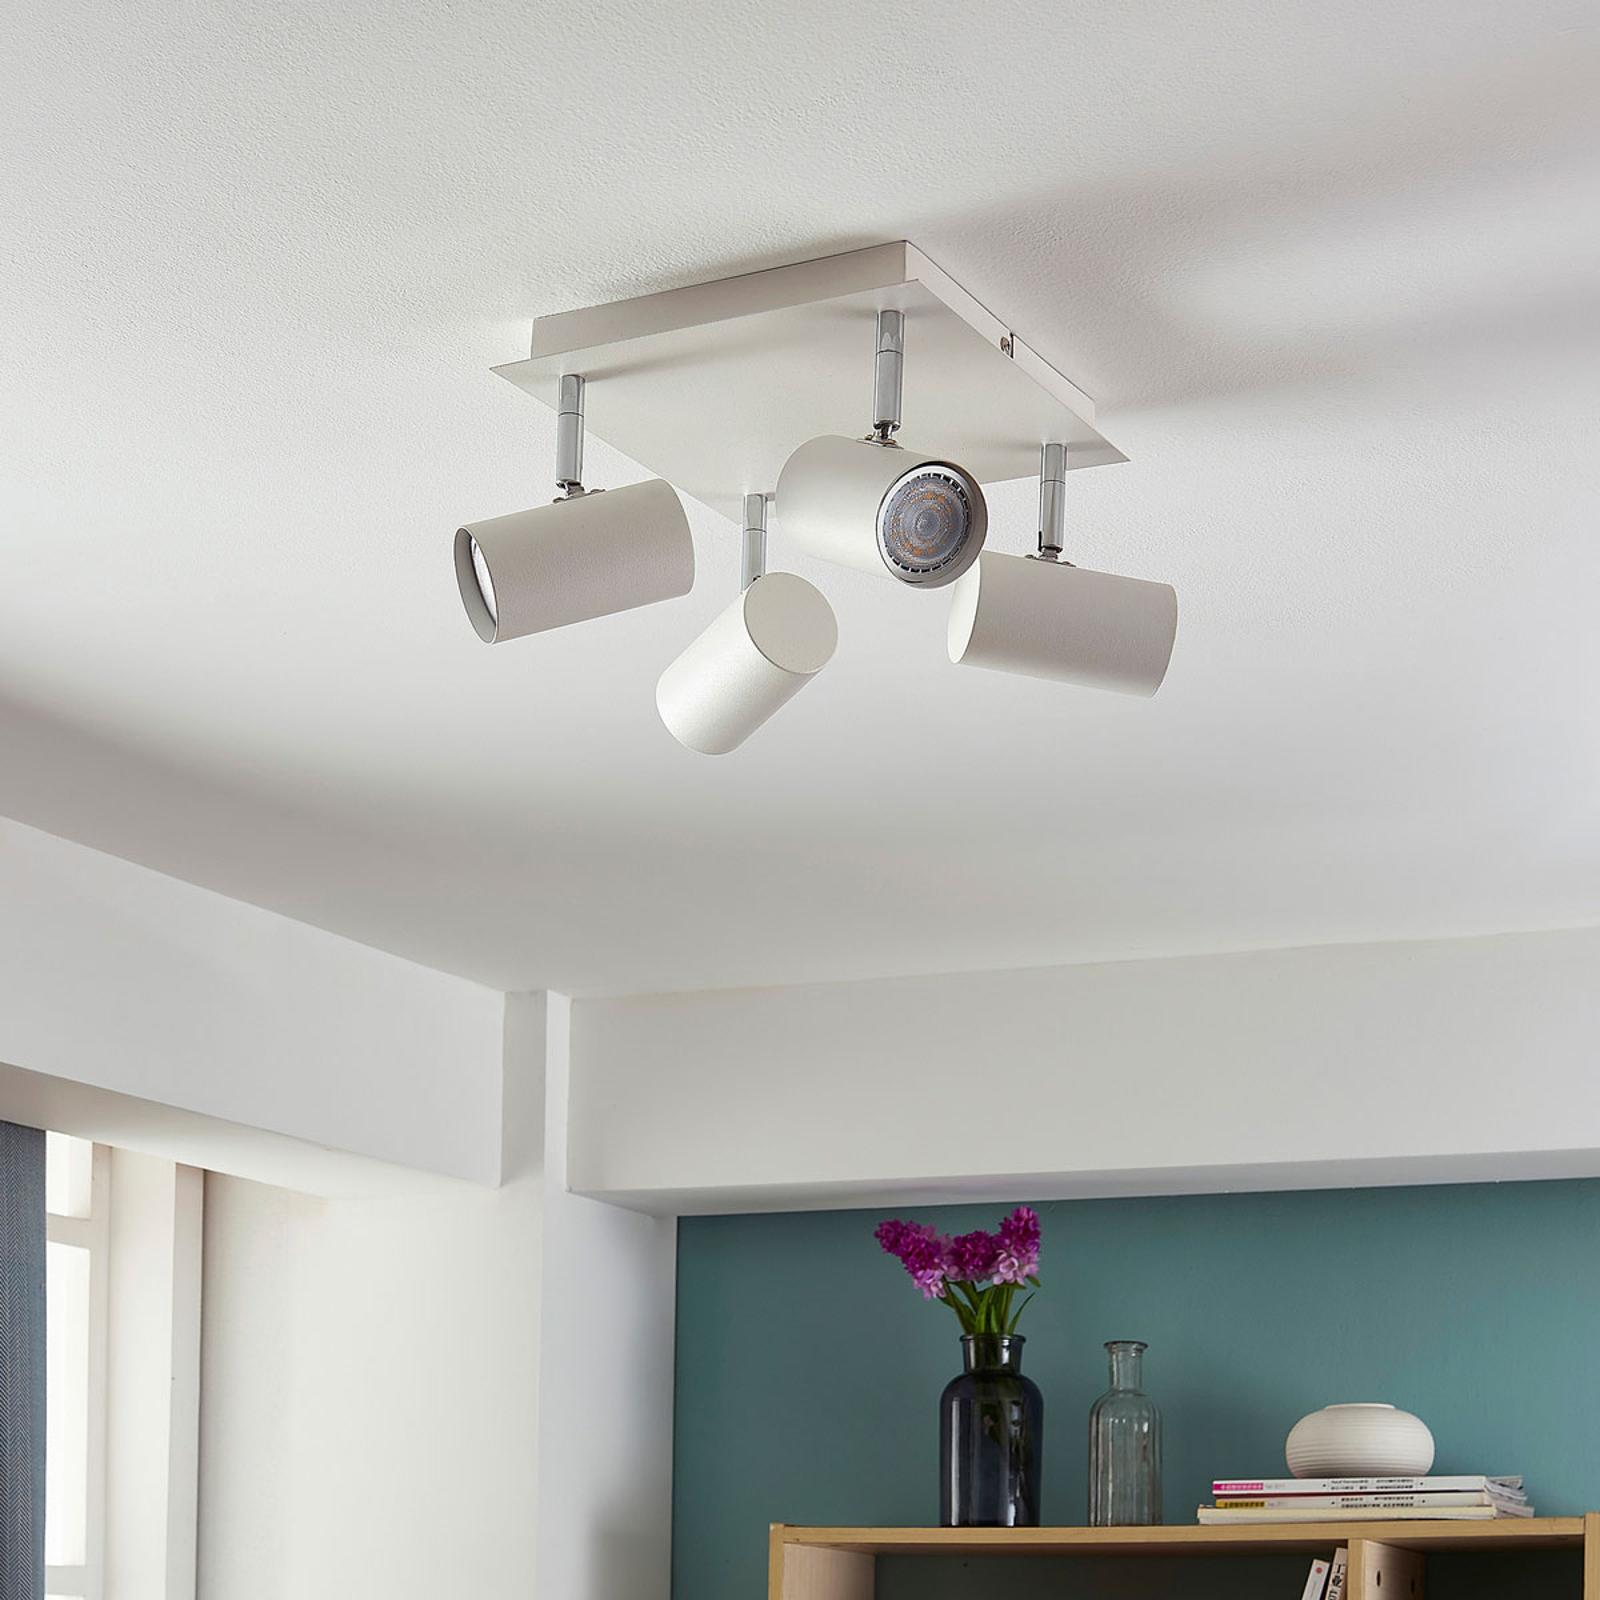 Lámpara LED de techo Iluk cuadrada, 4 brazos